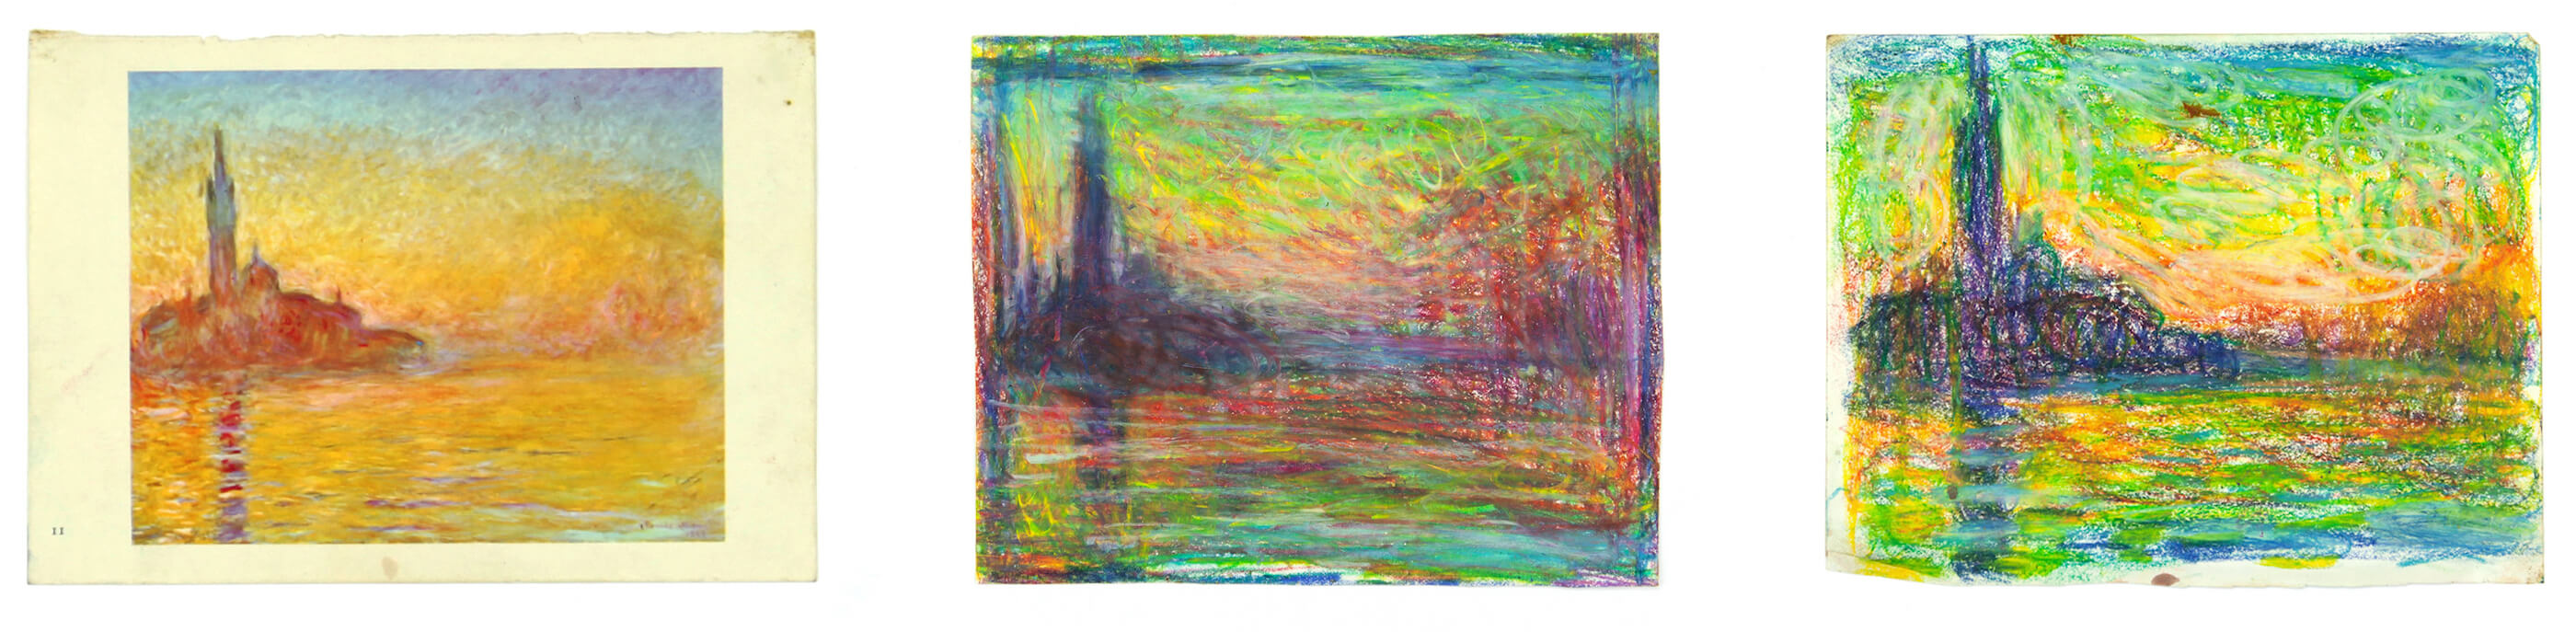 Sargy Mann, Monet Studies, Sketchbook, (Sargy Mann estate)